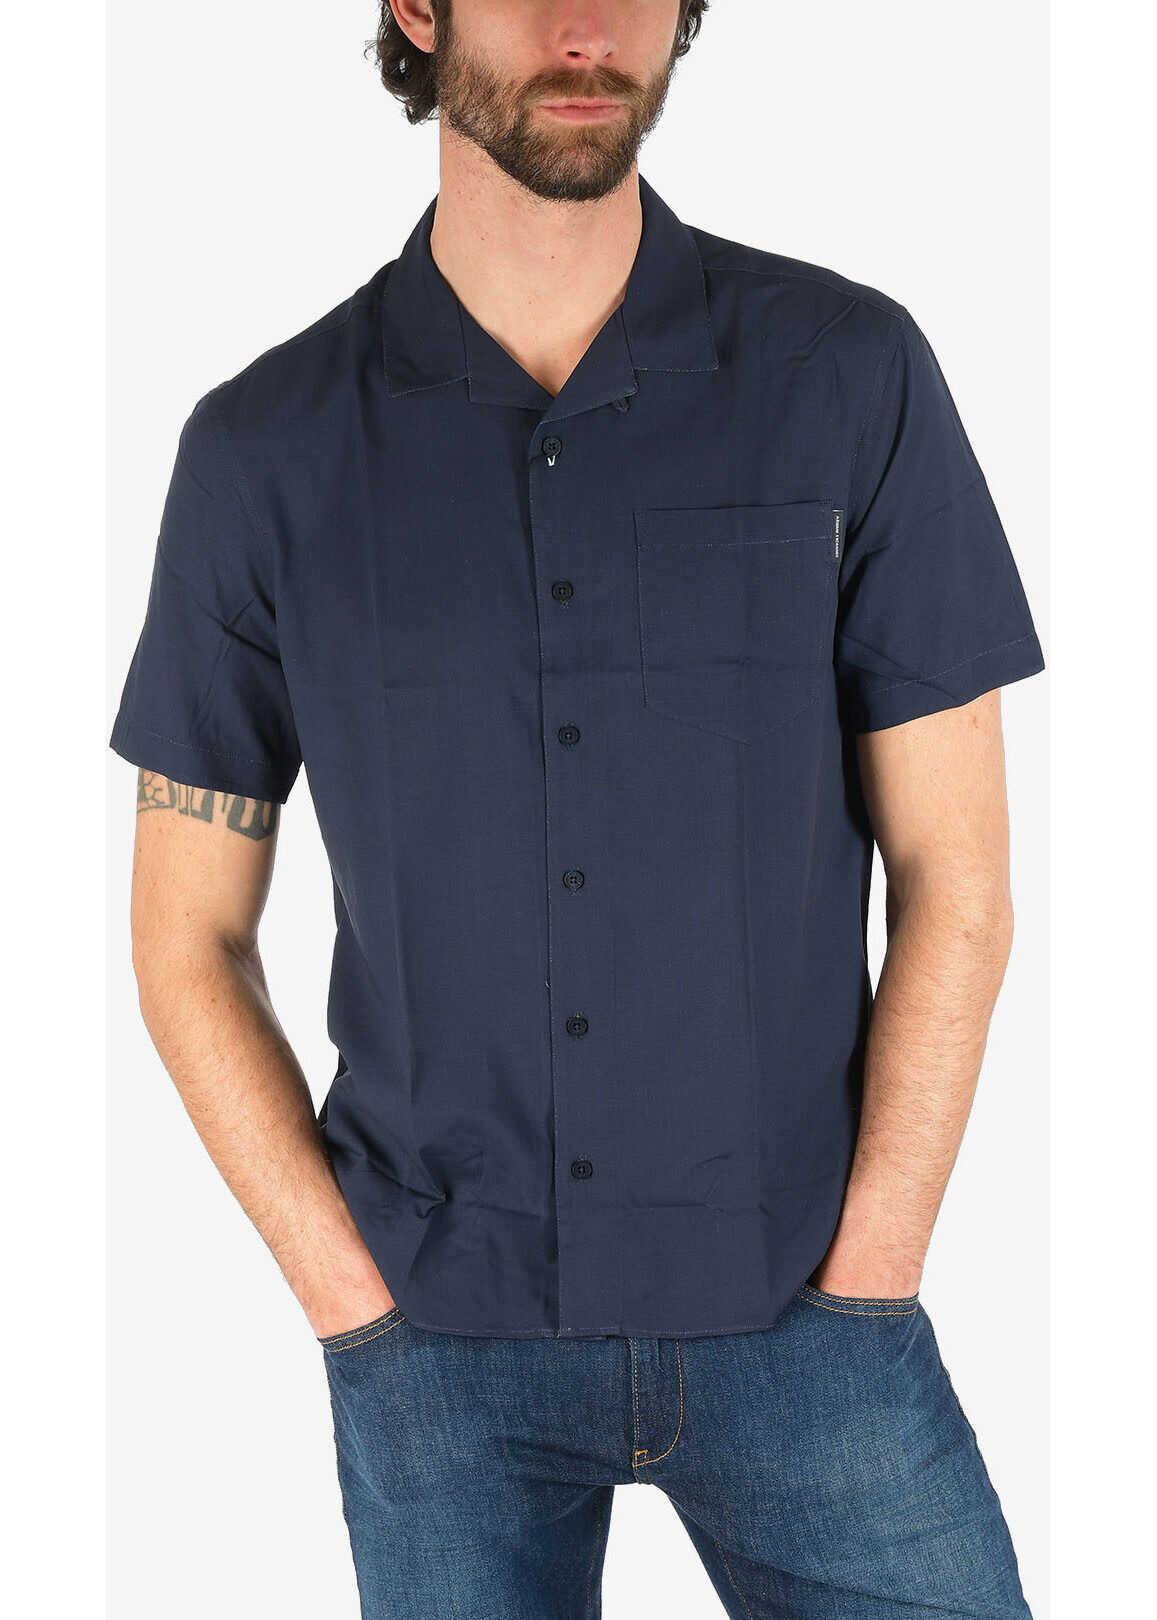 Armani ARMANI EXCHANGE Short Sleeve Shirt with Breast pocket BLUE imagine